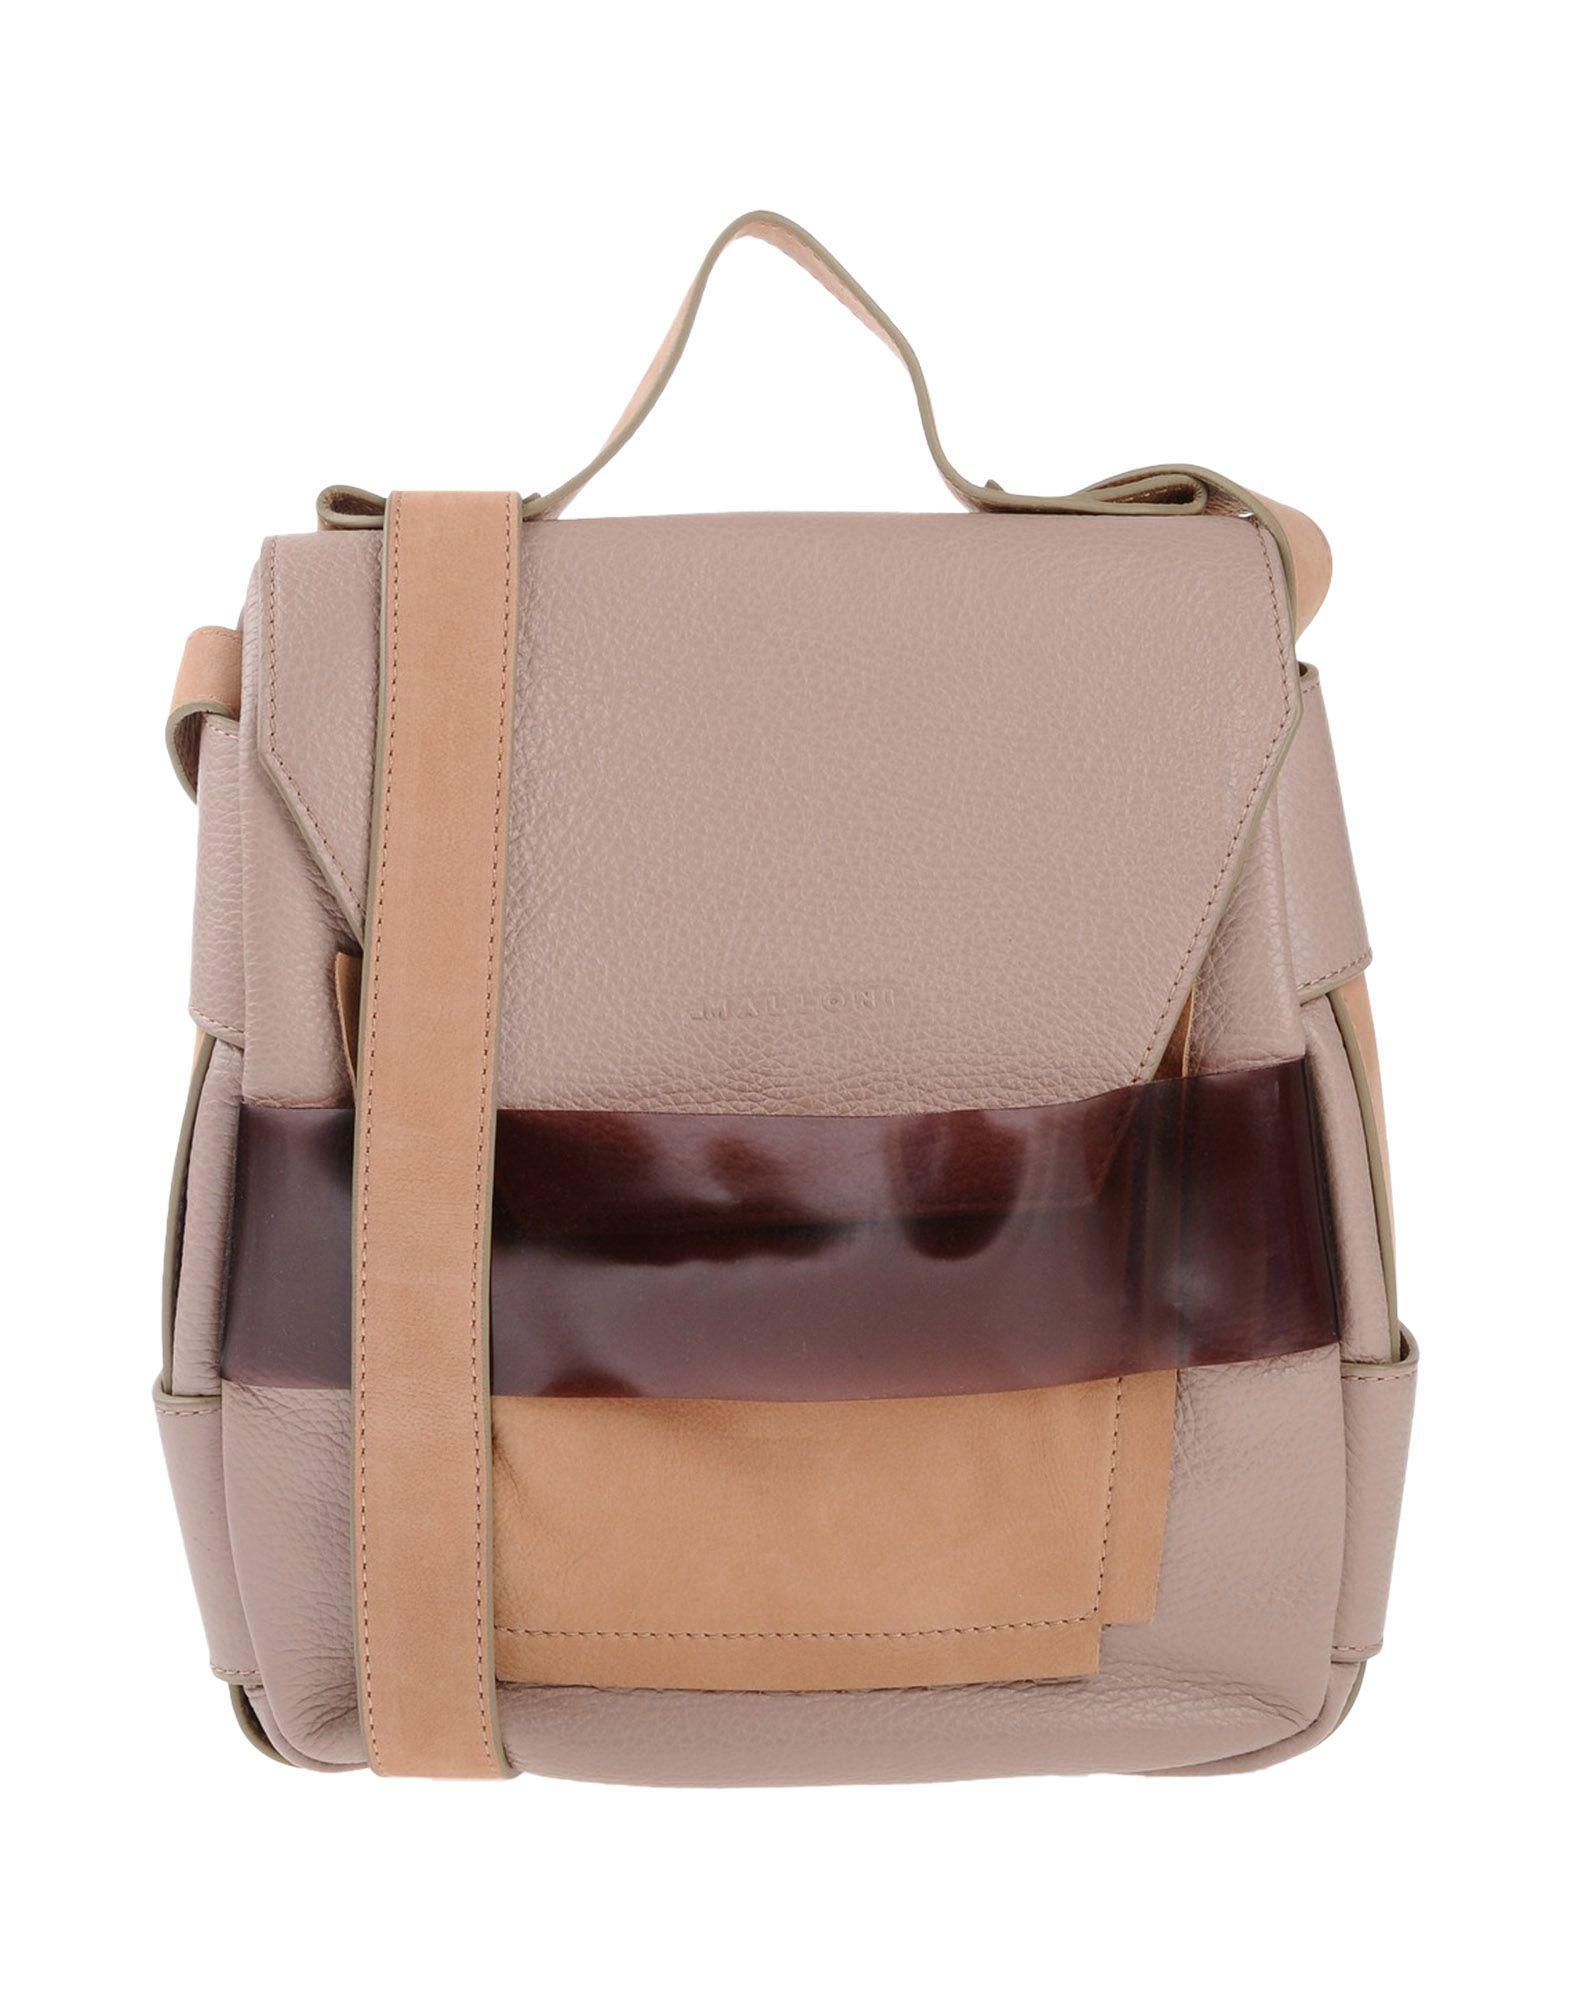 BAGS - Handbags Malloni xkOWStlC